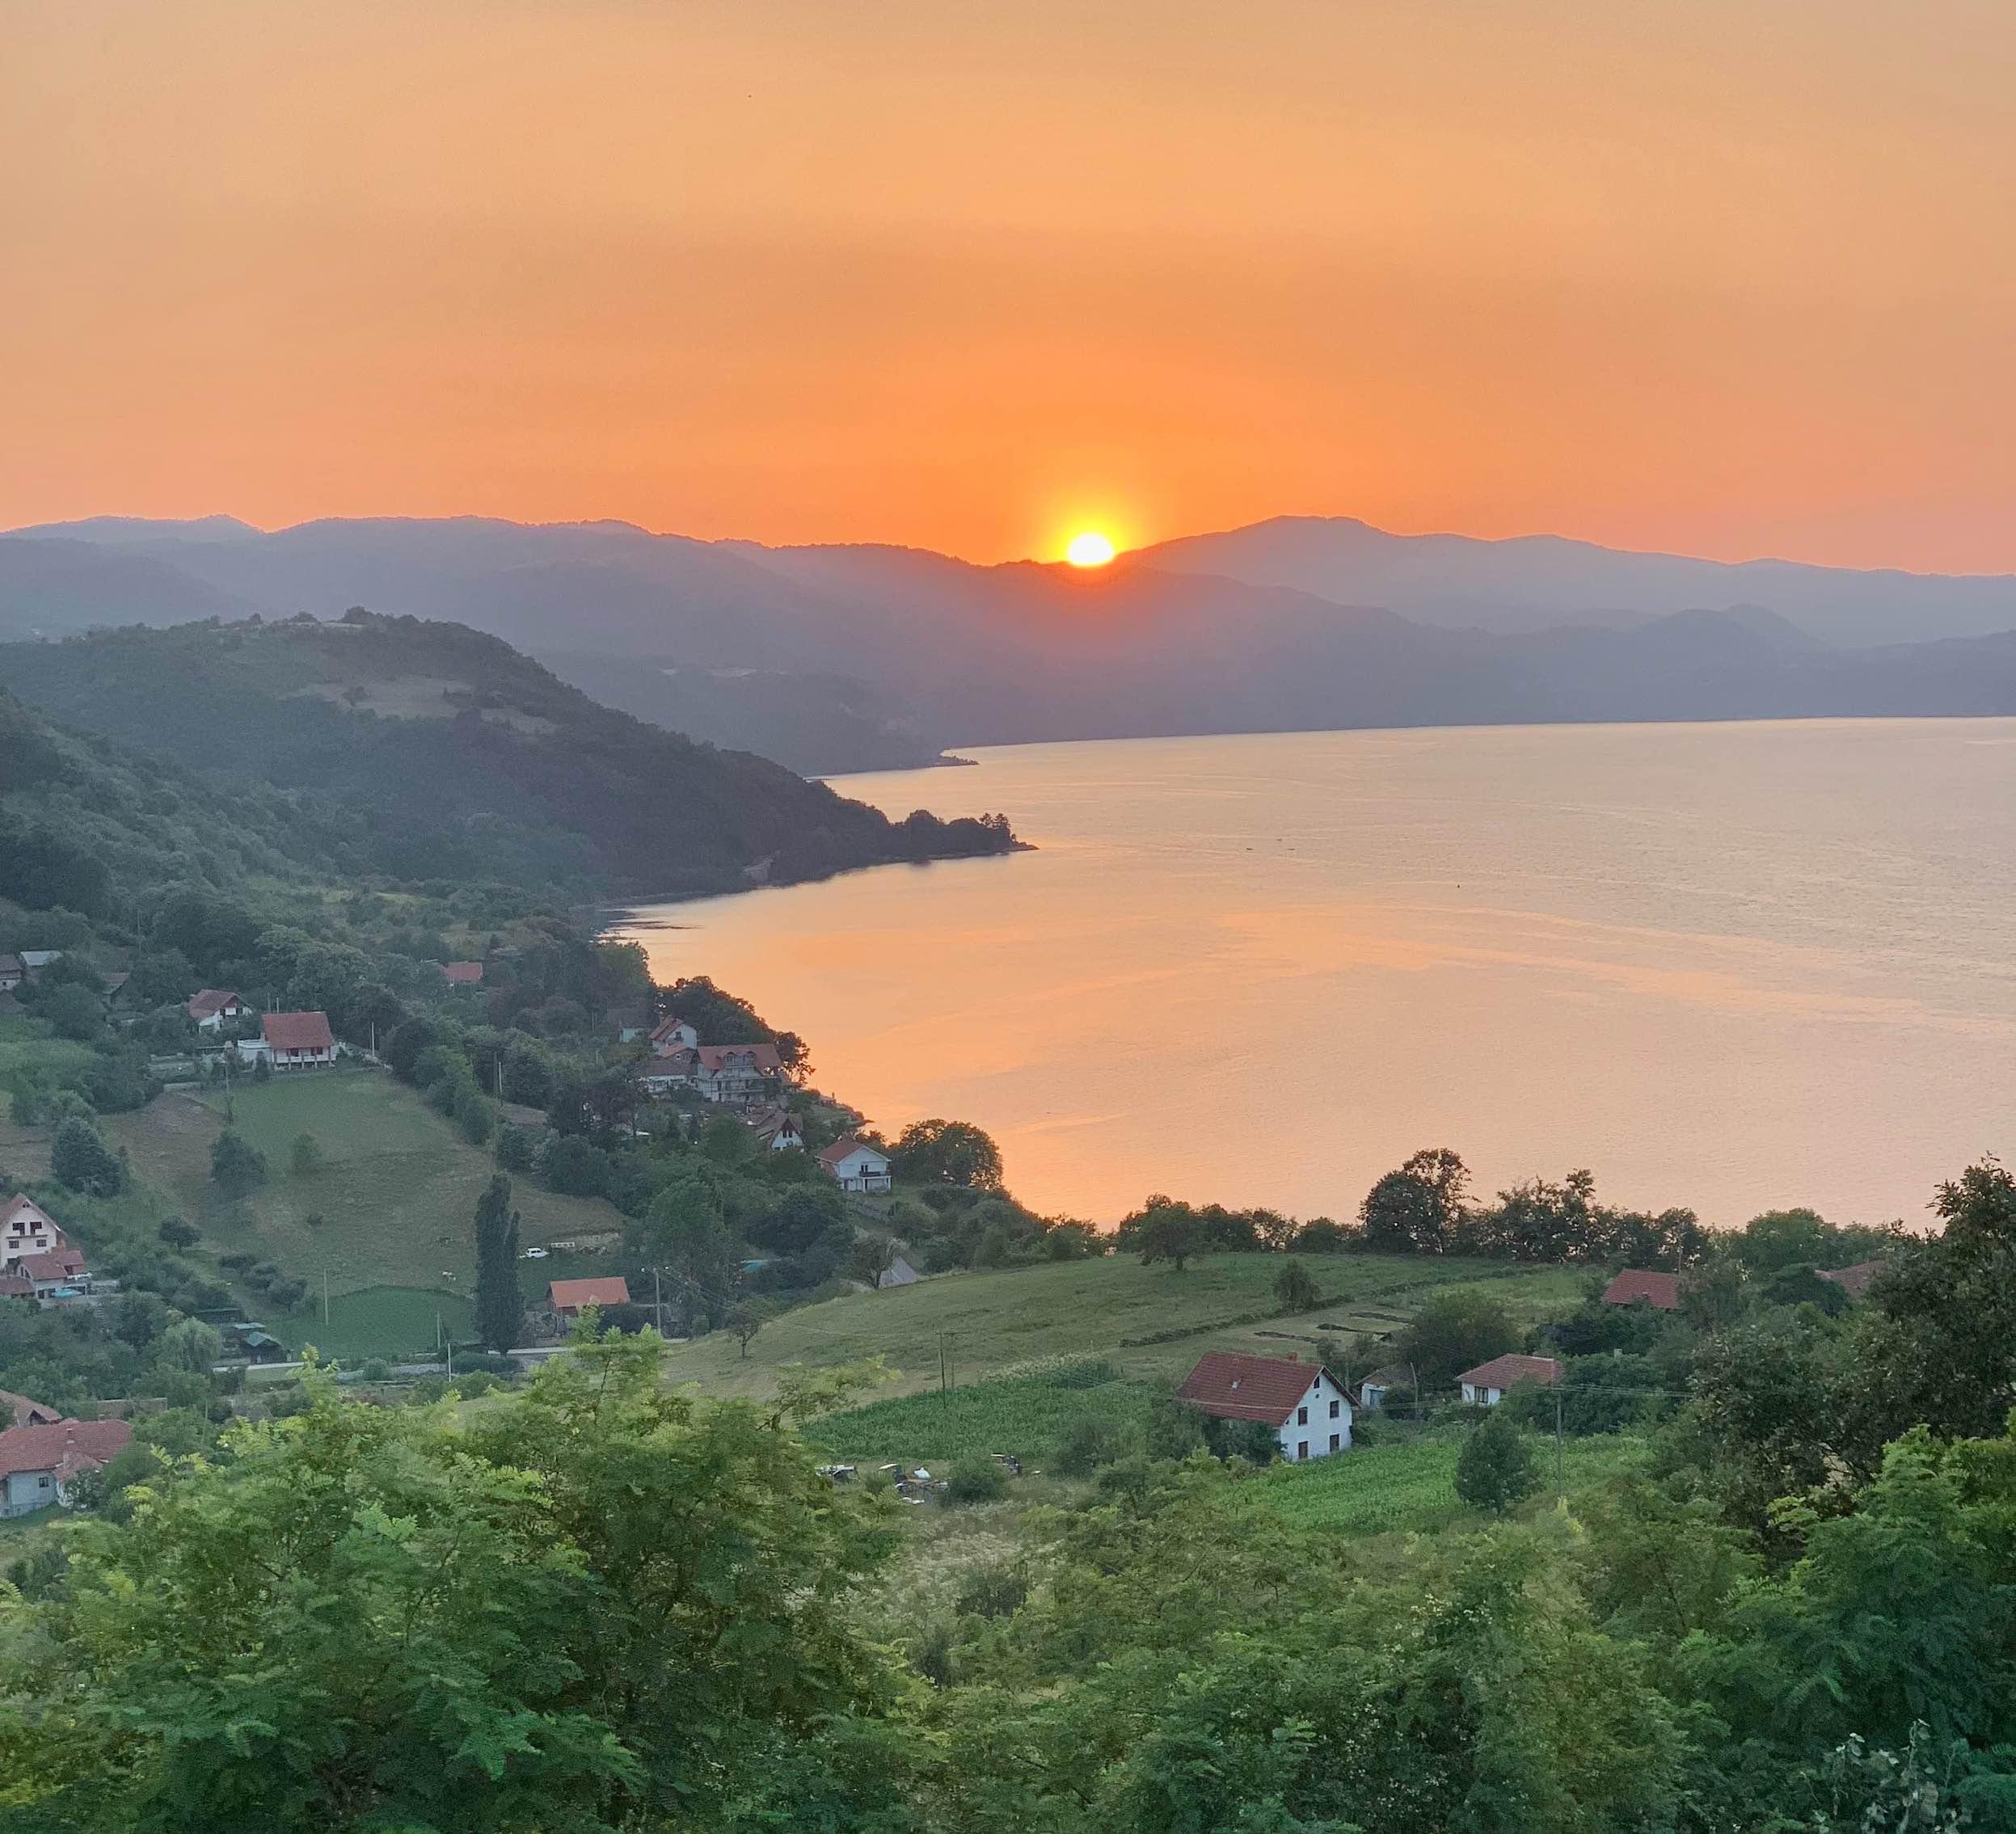 Sunset over Donji Milanovac in Serbia